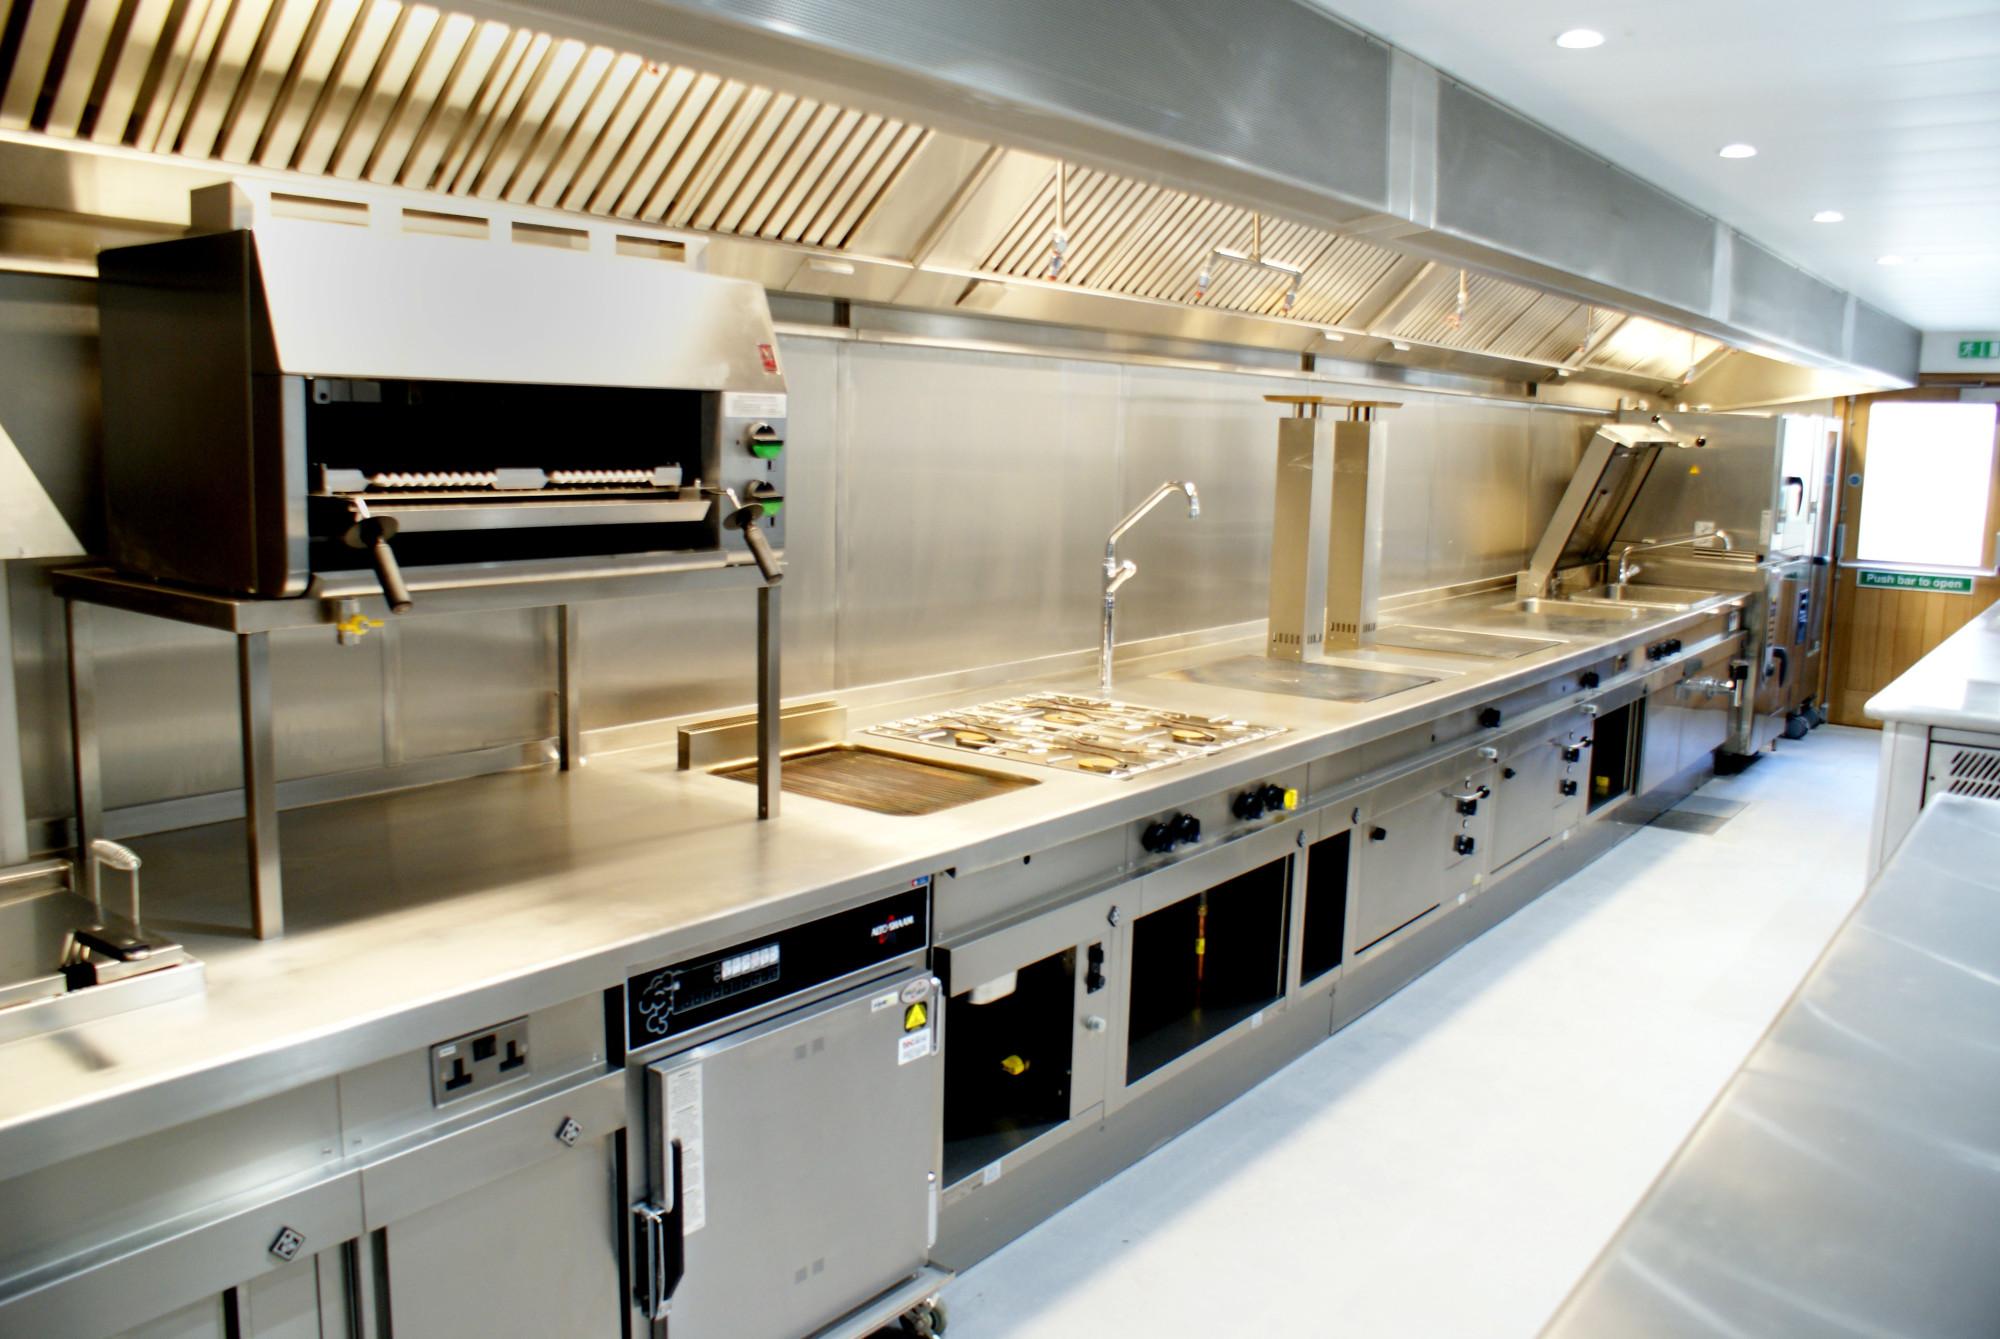 Our Services Visiontec Enterprises Ltd Commercial Kitchen And Appliances In Kenya